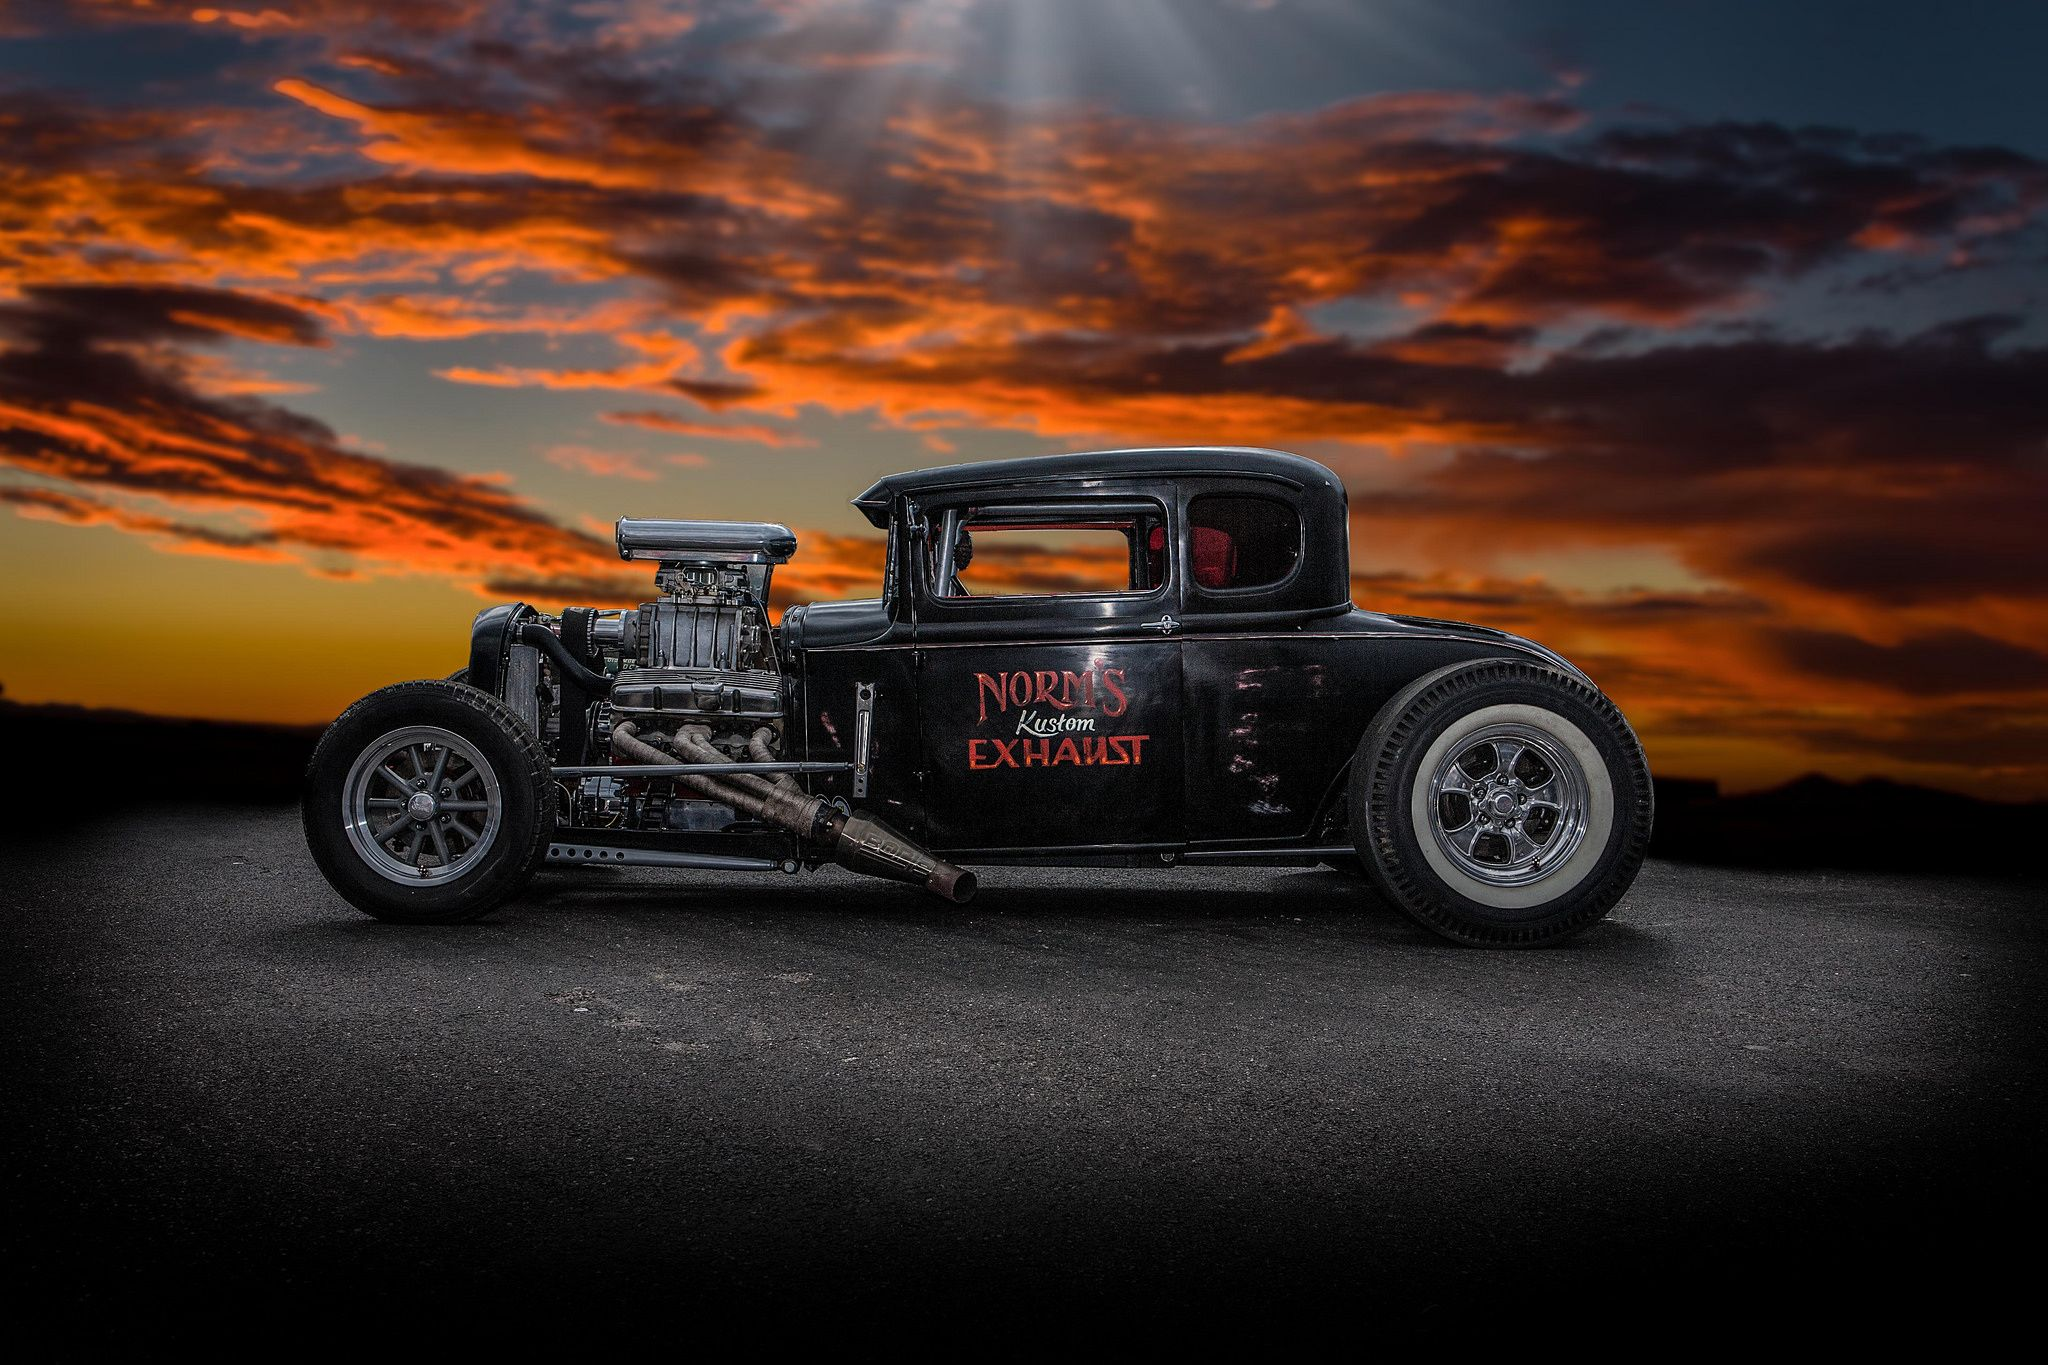 Hot Rod Cars Wallpapers Photo Otomotif Wallpaper